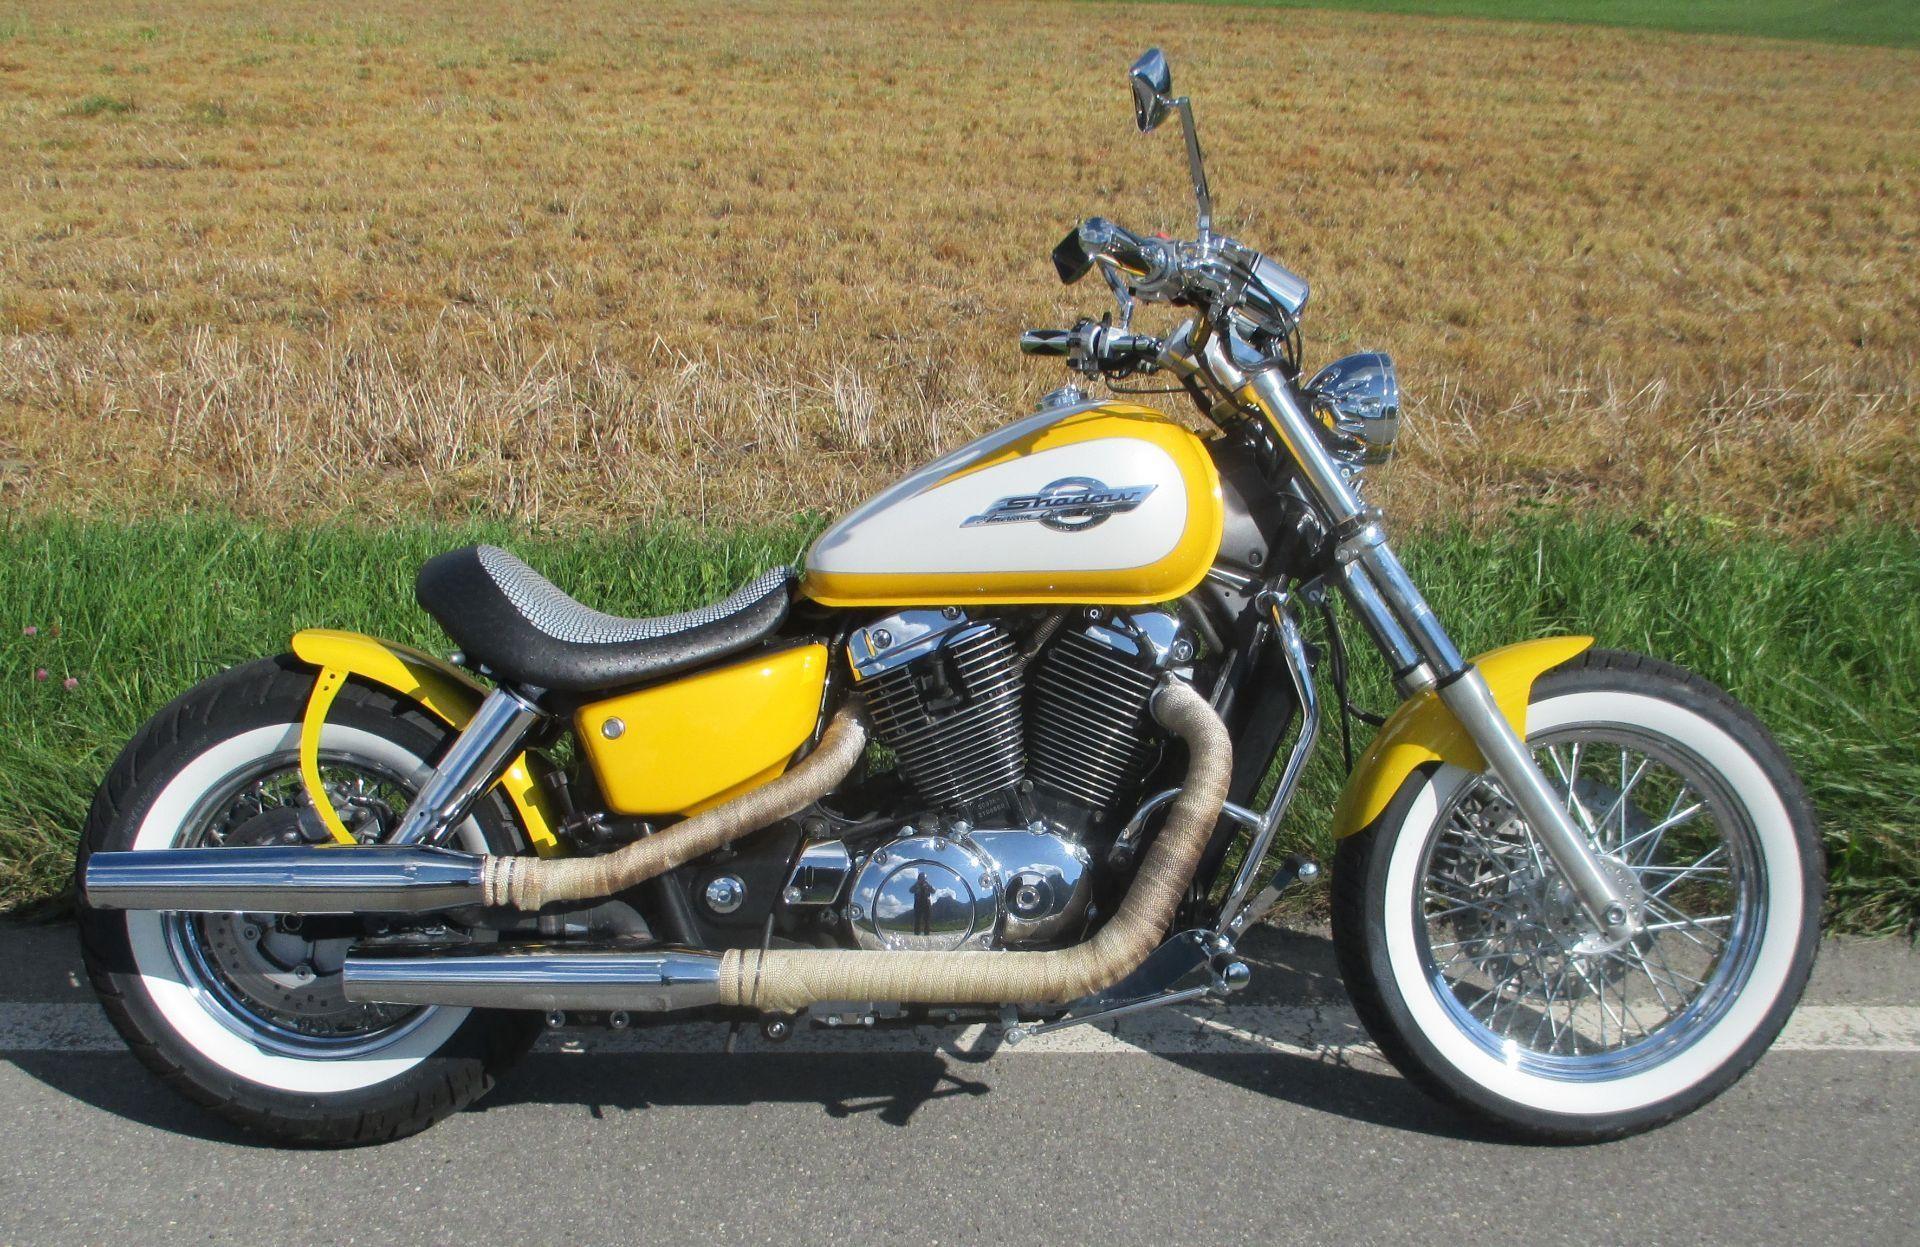 moto occasions acheter honda vt 1100 c2 shadow b2r bobber bikes 2 rock thun. Black Bedroom Furniture Sets. Home Design Ideas